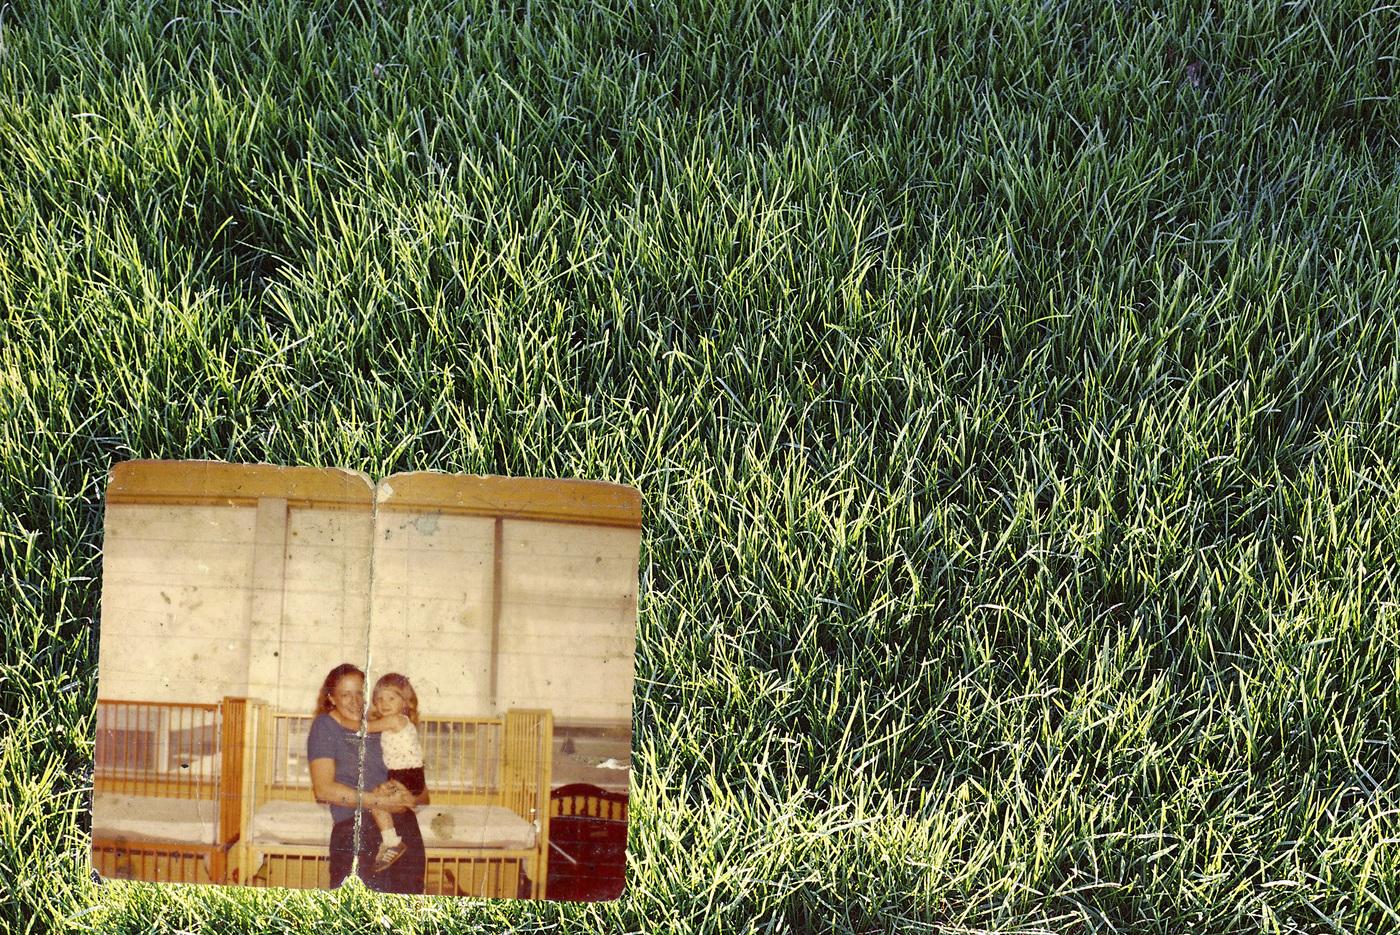 Brian Garbrecht - Deborah Cerveny 1963-2014 2019. Family Archive atop Scanned Negative.